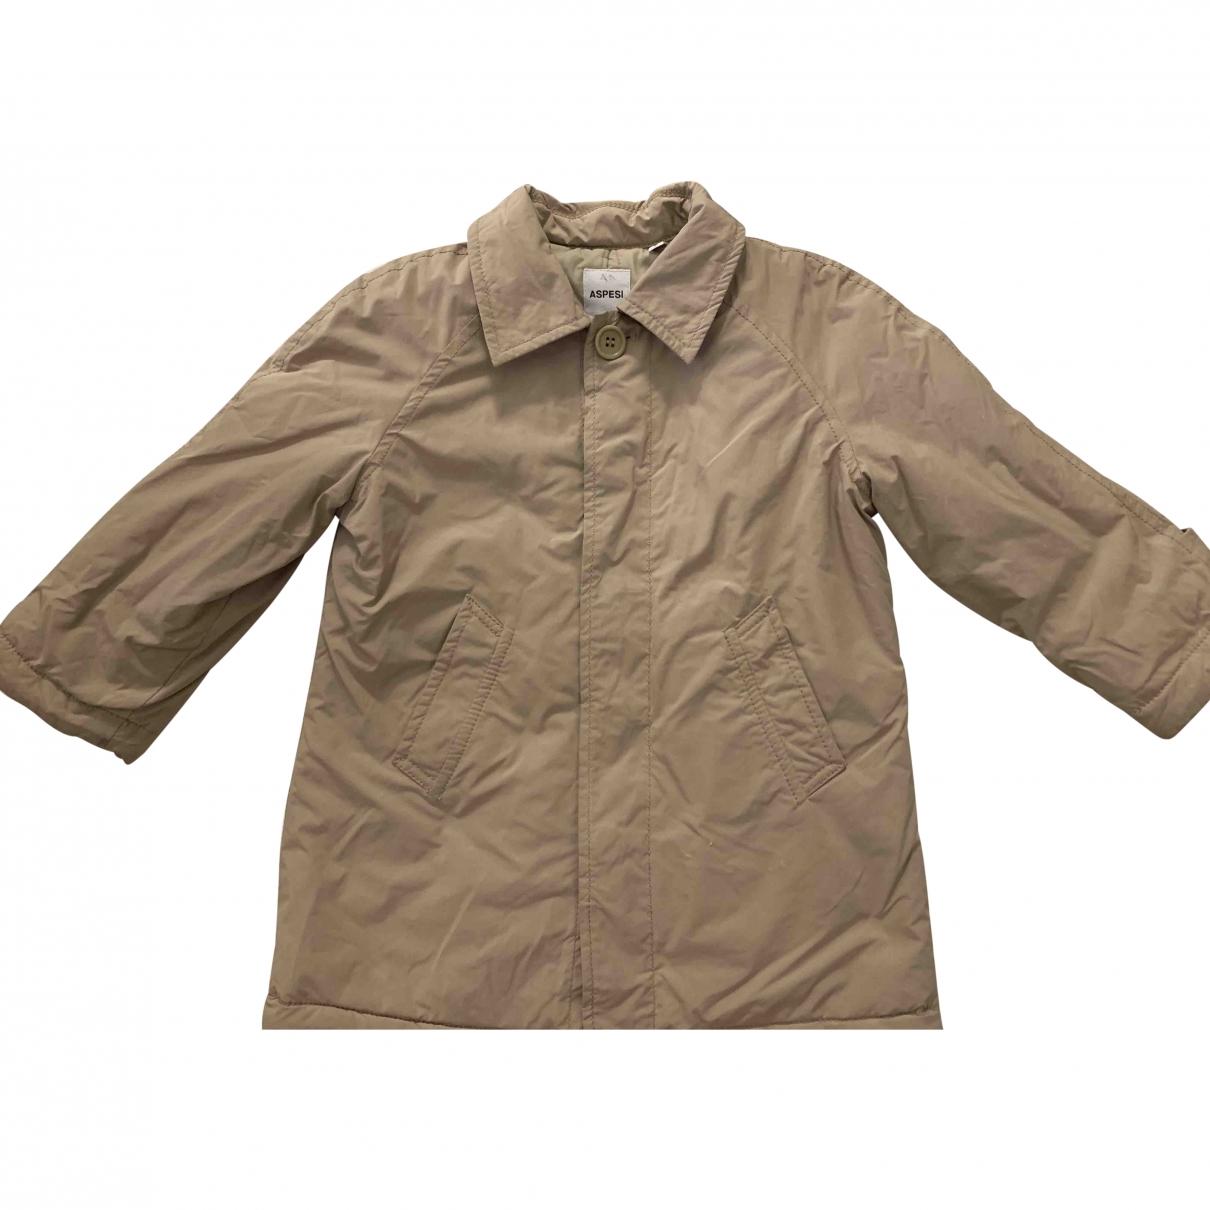 Aspesi \N Beige jacket & coat for Kids 2 years - up to 86cm FR